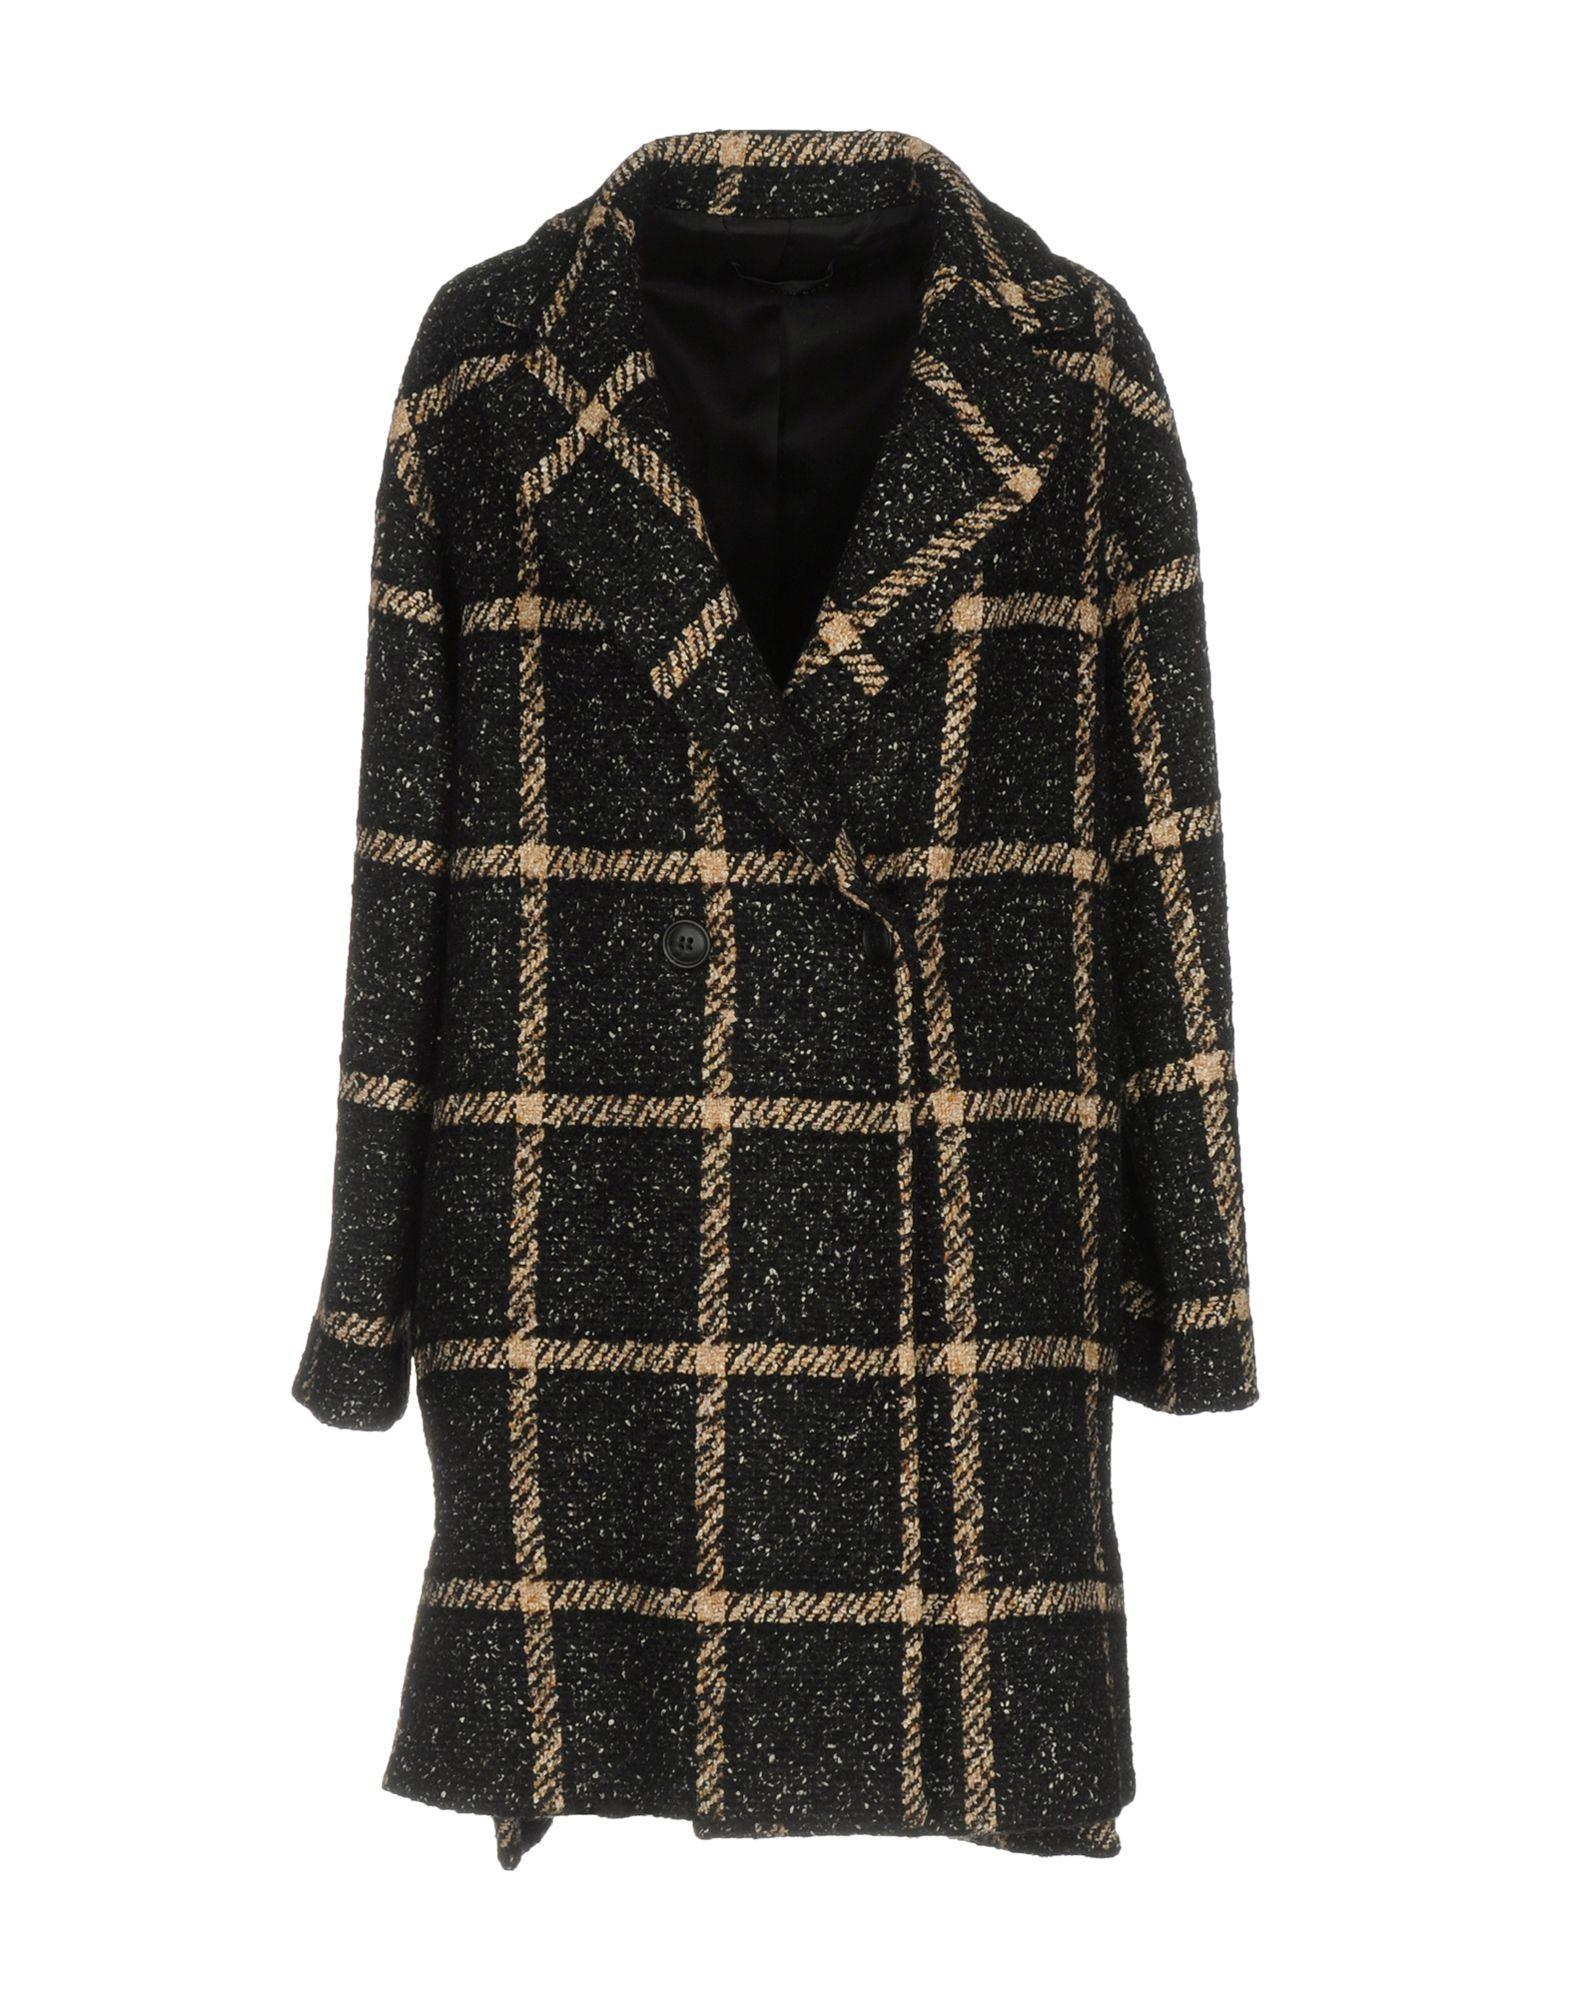 Brian Dales Coats In Black